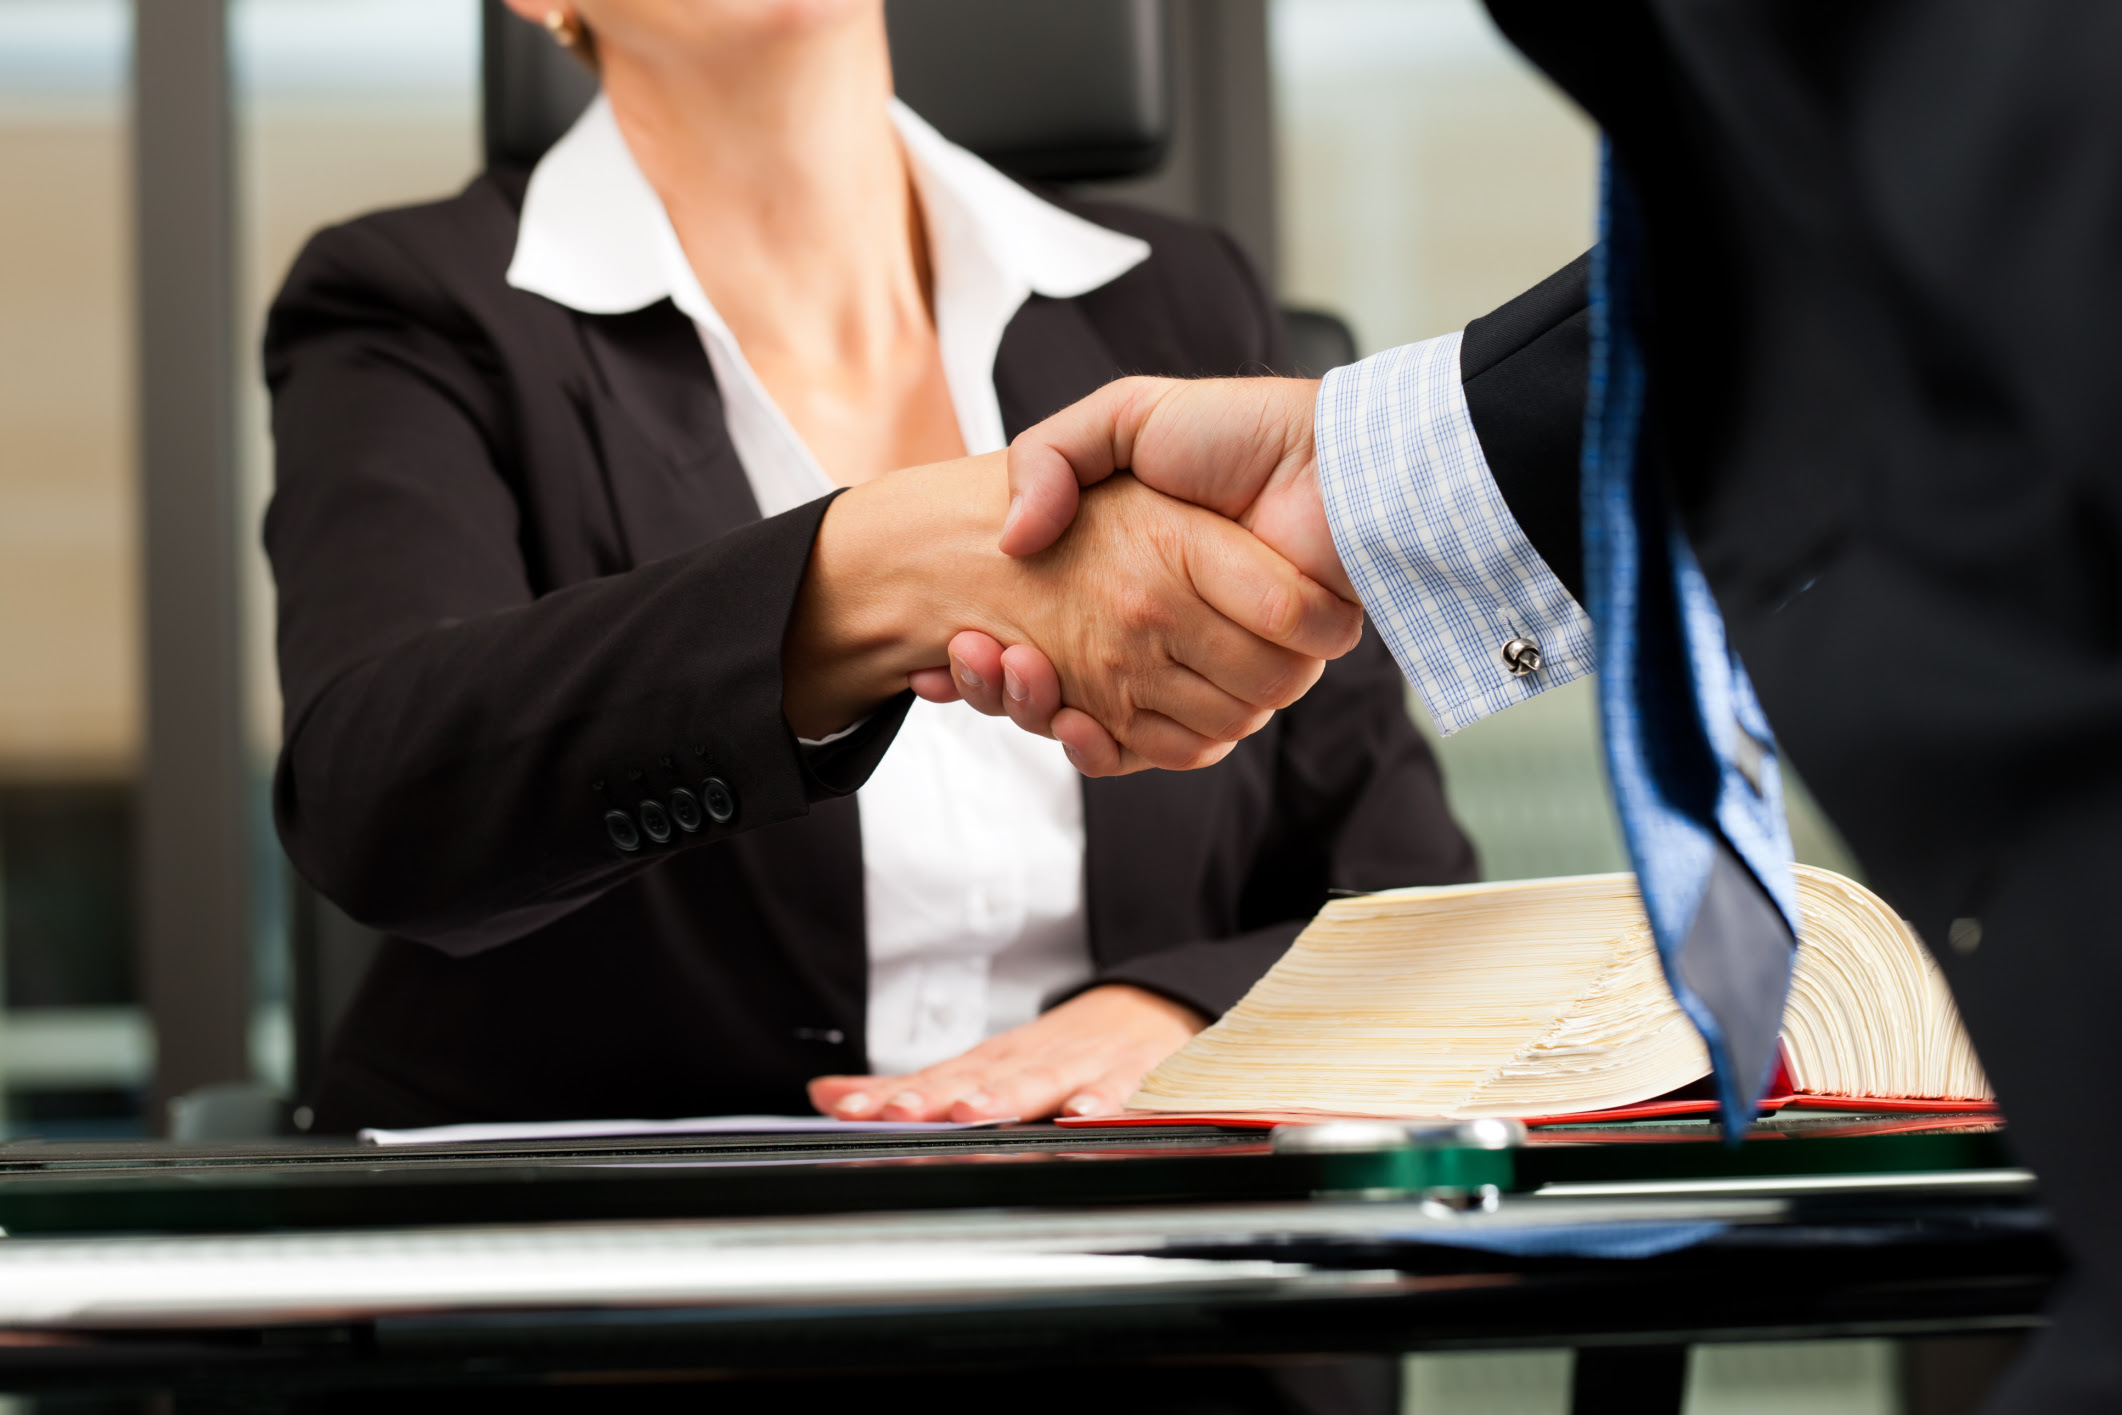 http://lerablog.org/wp-content/uploads/2013/05/lawyer-handshake.jpg